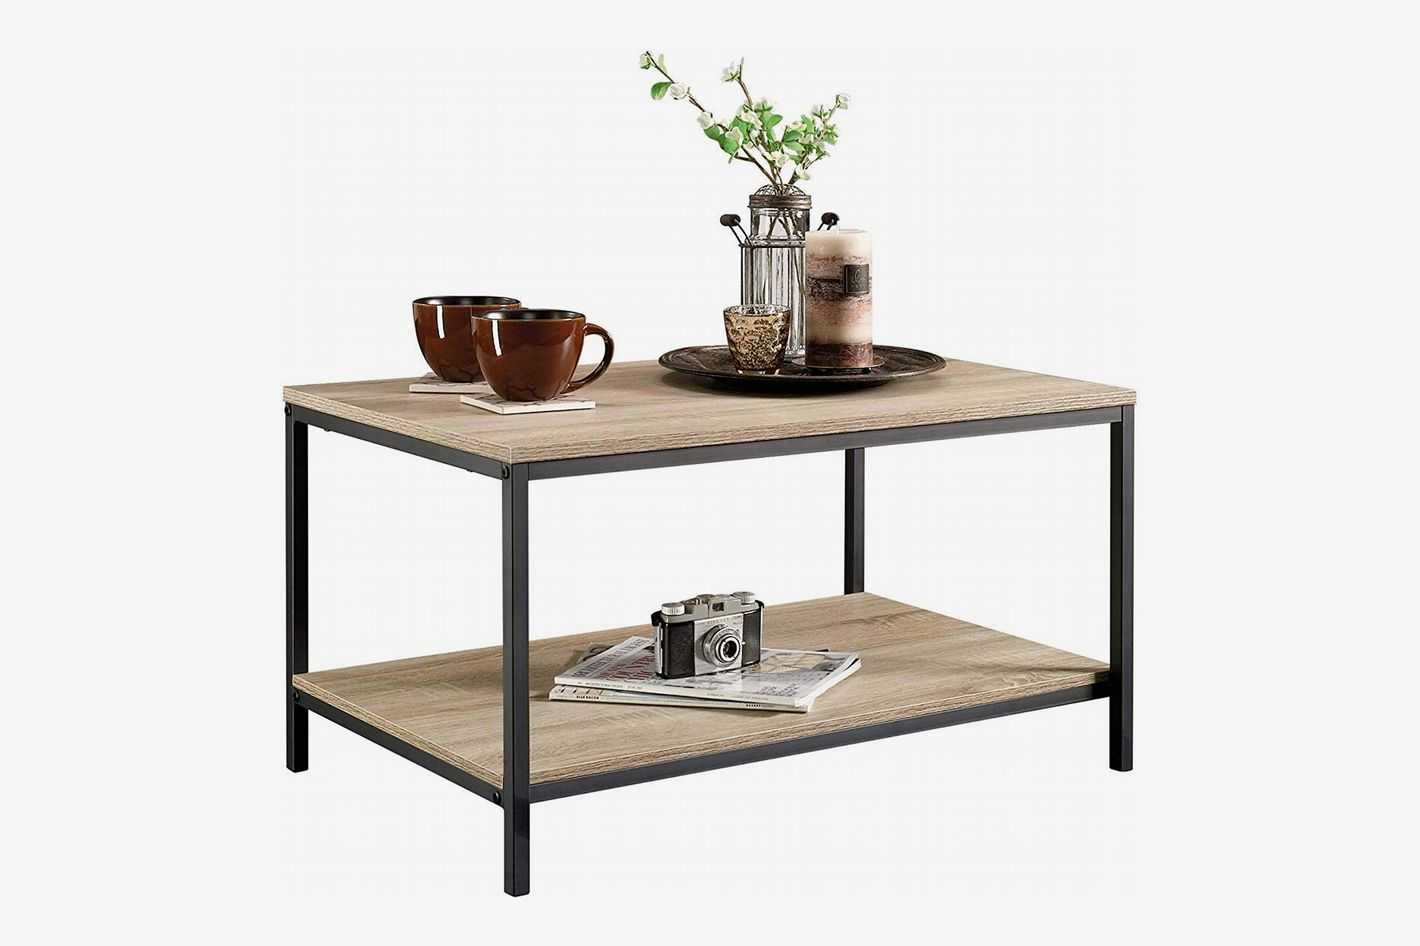 Sauder 420275 North Avenue Coffee Table